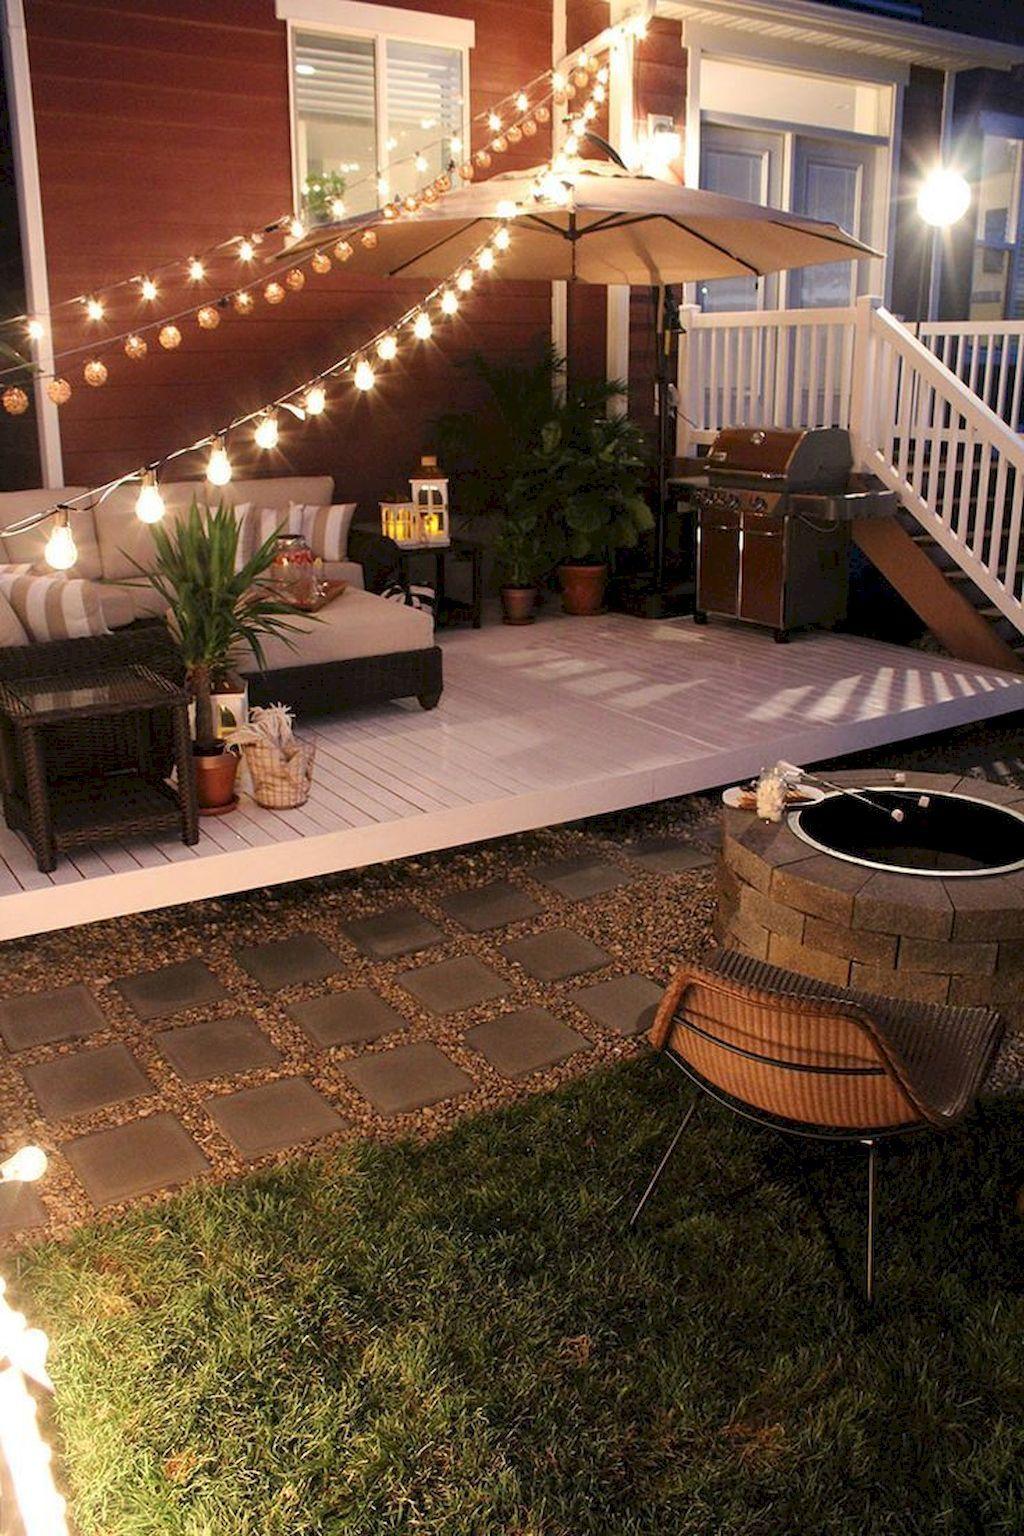 Summery backyard diy projects that are fantastis ideas 25 summery backyard diy projects that are fantastis ideas 25 solutioingenieria Choice Image